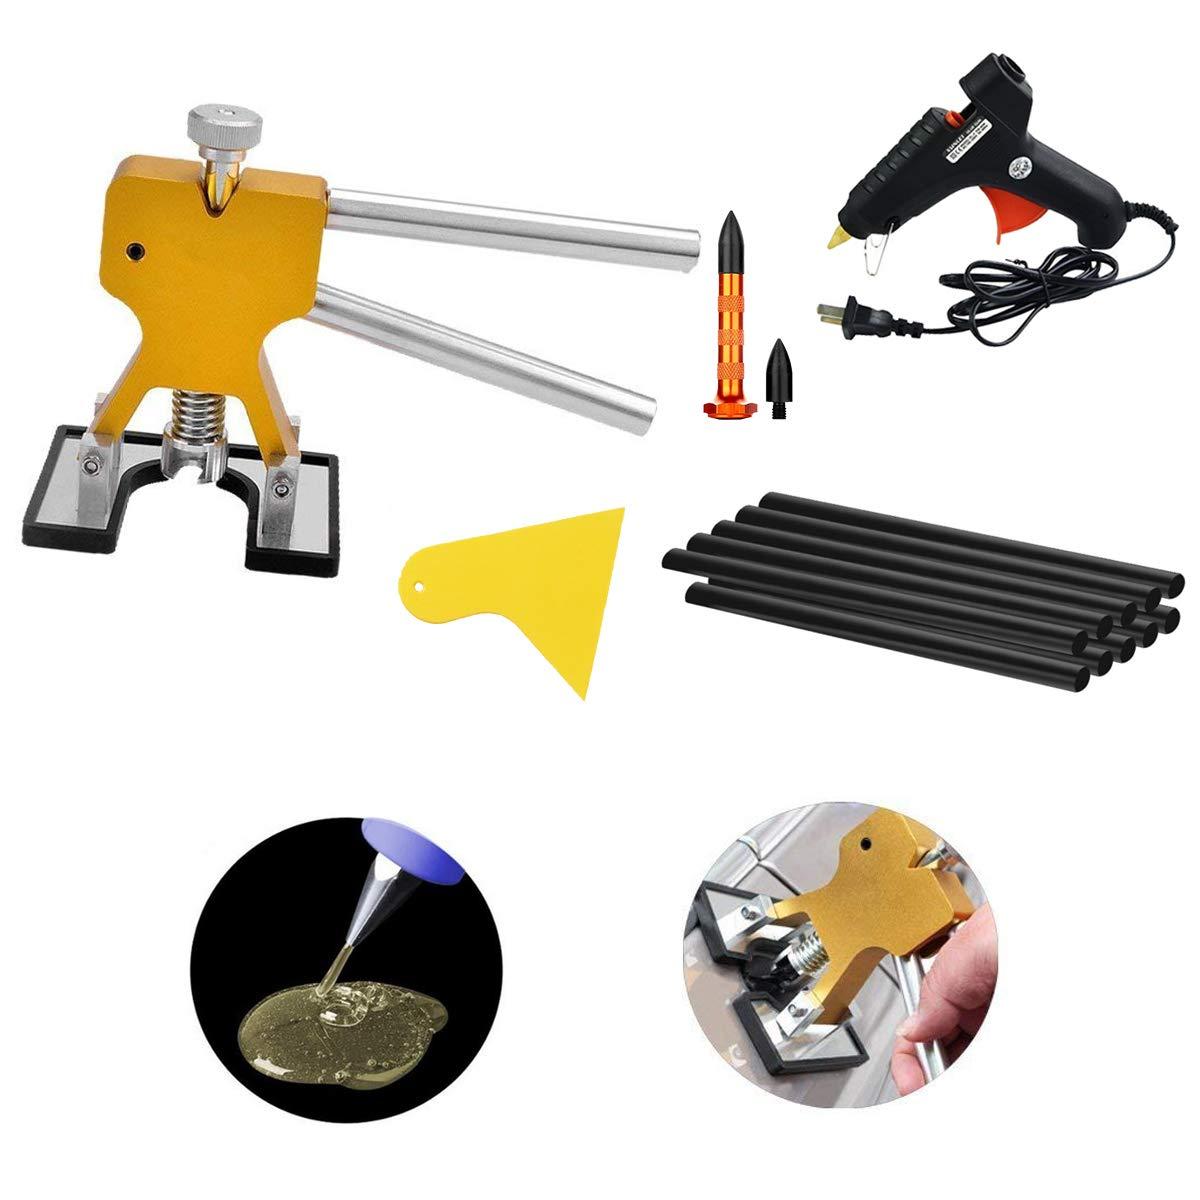 MMPP PDR Tools Golden Dent Lifter Dent Remover Paintless Dent Repair Tools Kit PDR Puller Kits with Hot Glue Gun Glue Sticks Scraper Tap Down Tools …